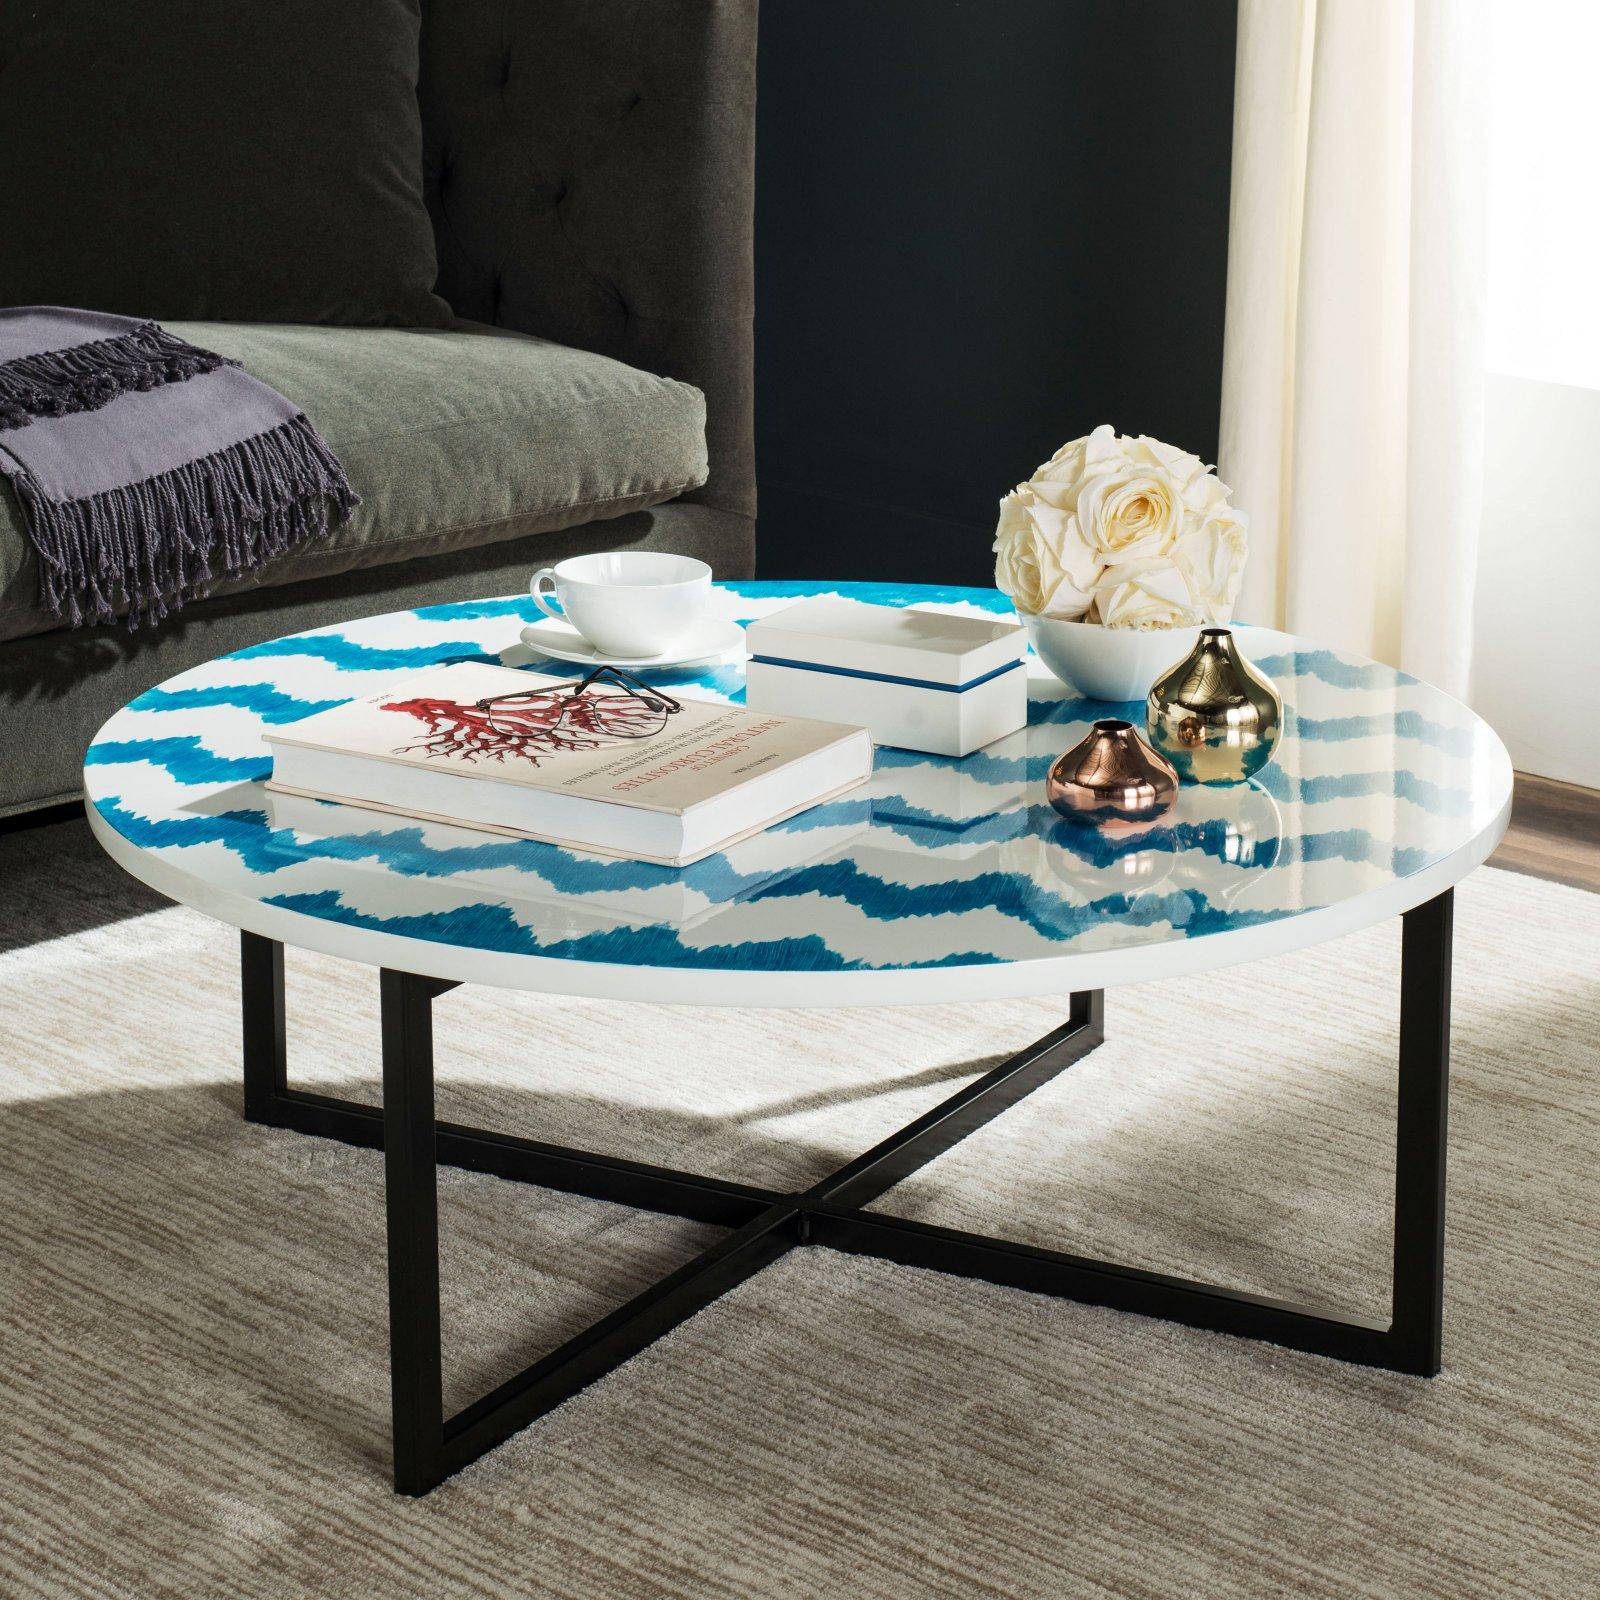 "Safavieh Cheyenne 39"" Round Coffee Table, Multiple Colors"